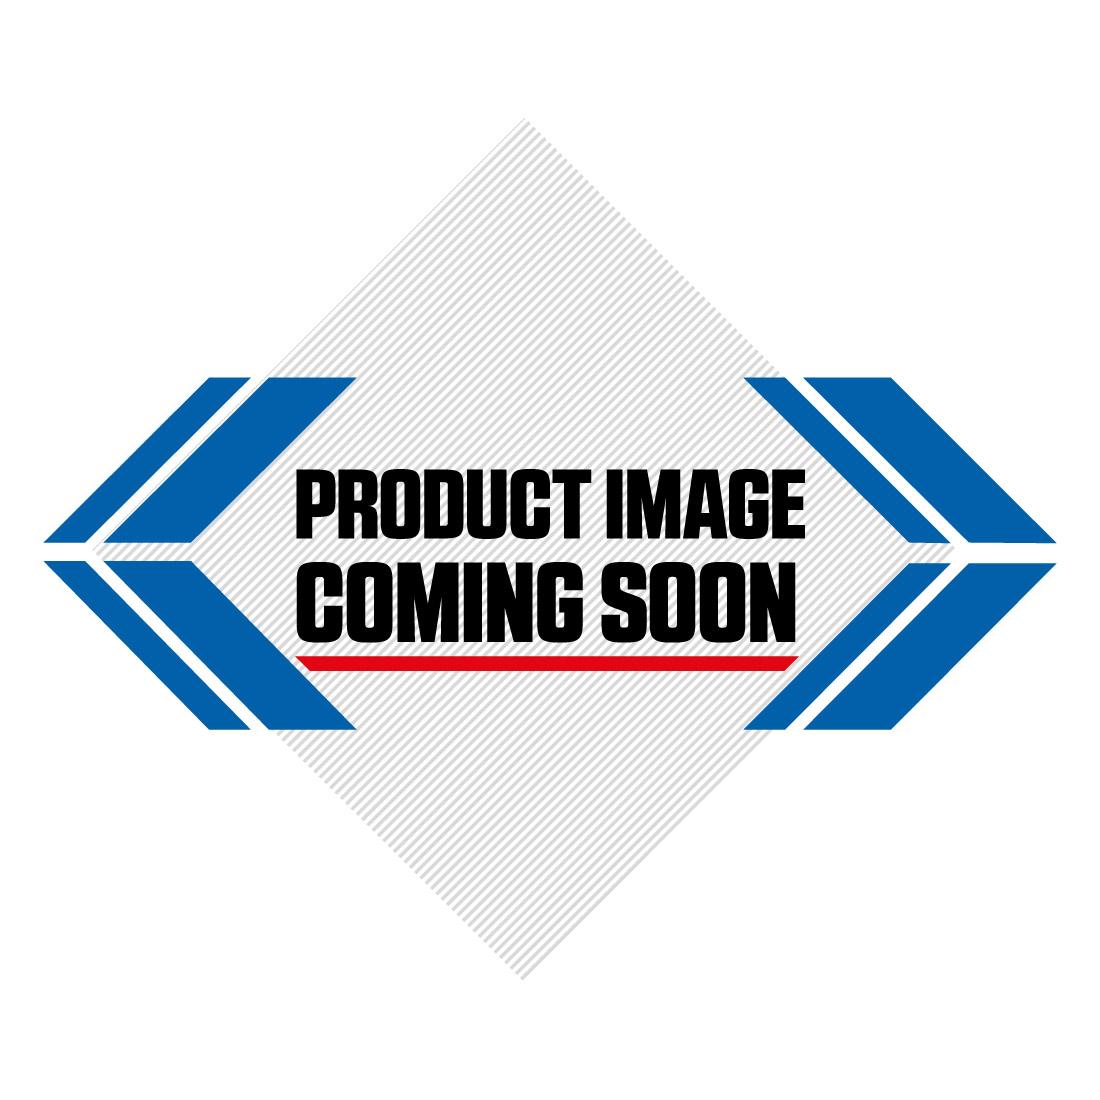 Suzuki Plastic Kit  RM 125 250 (99-00) Black Image-3>